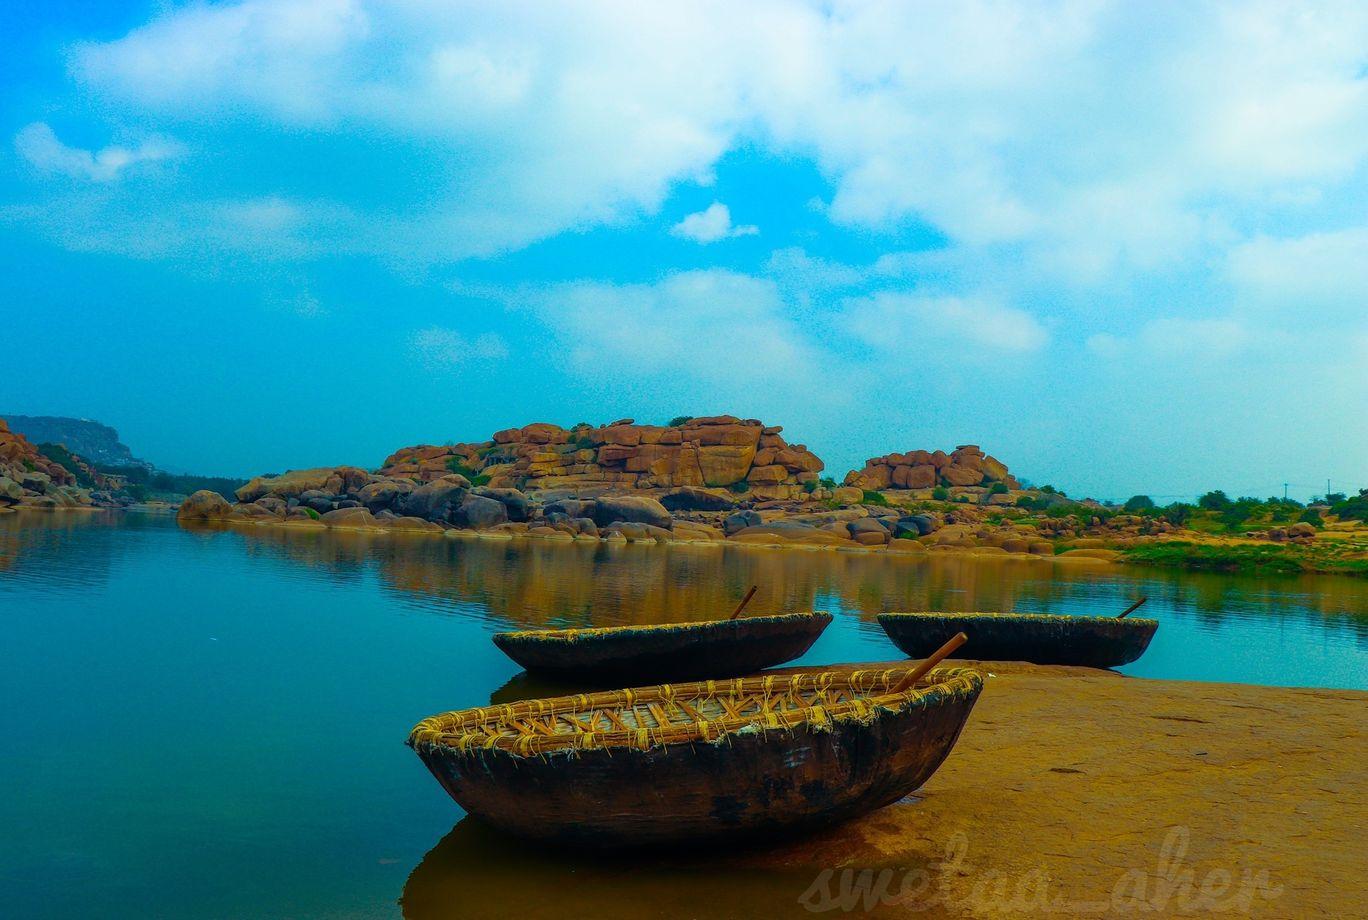 Photo of Tungabhadra River By Shweta aher